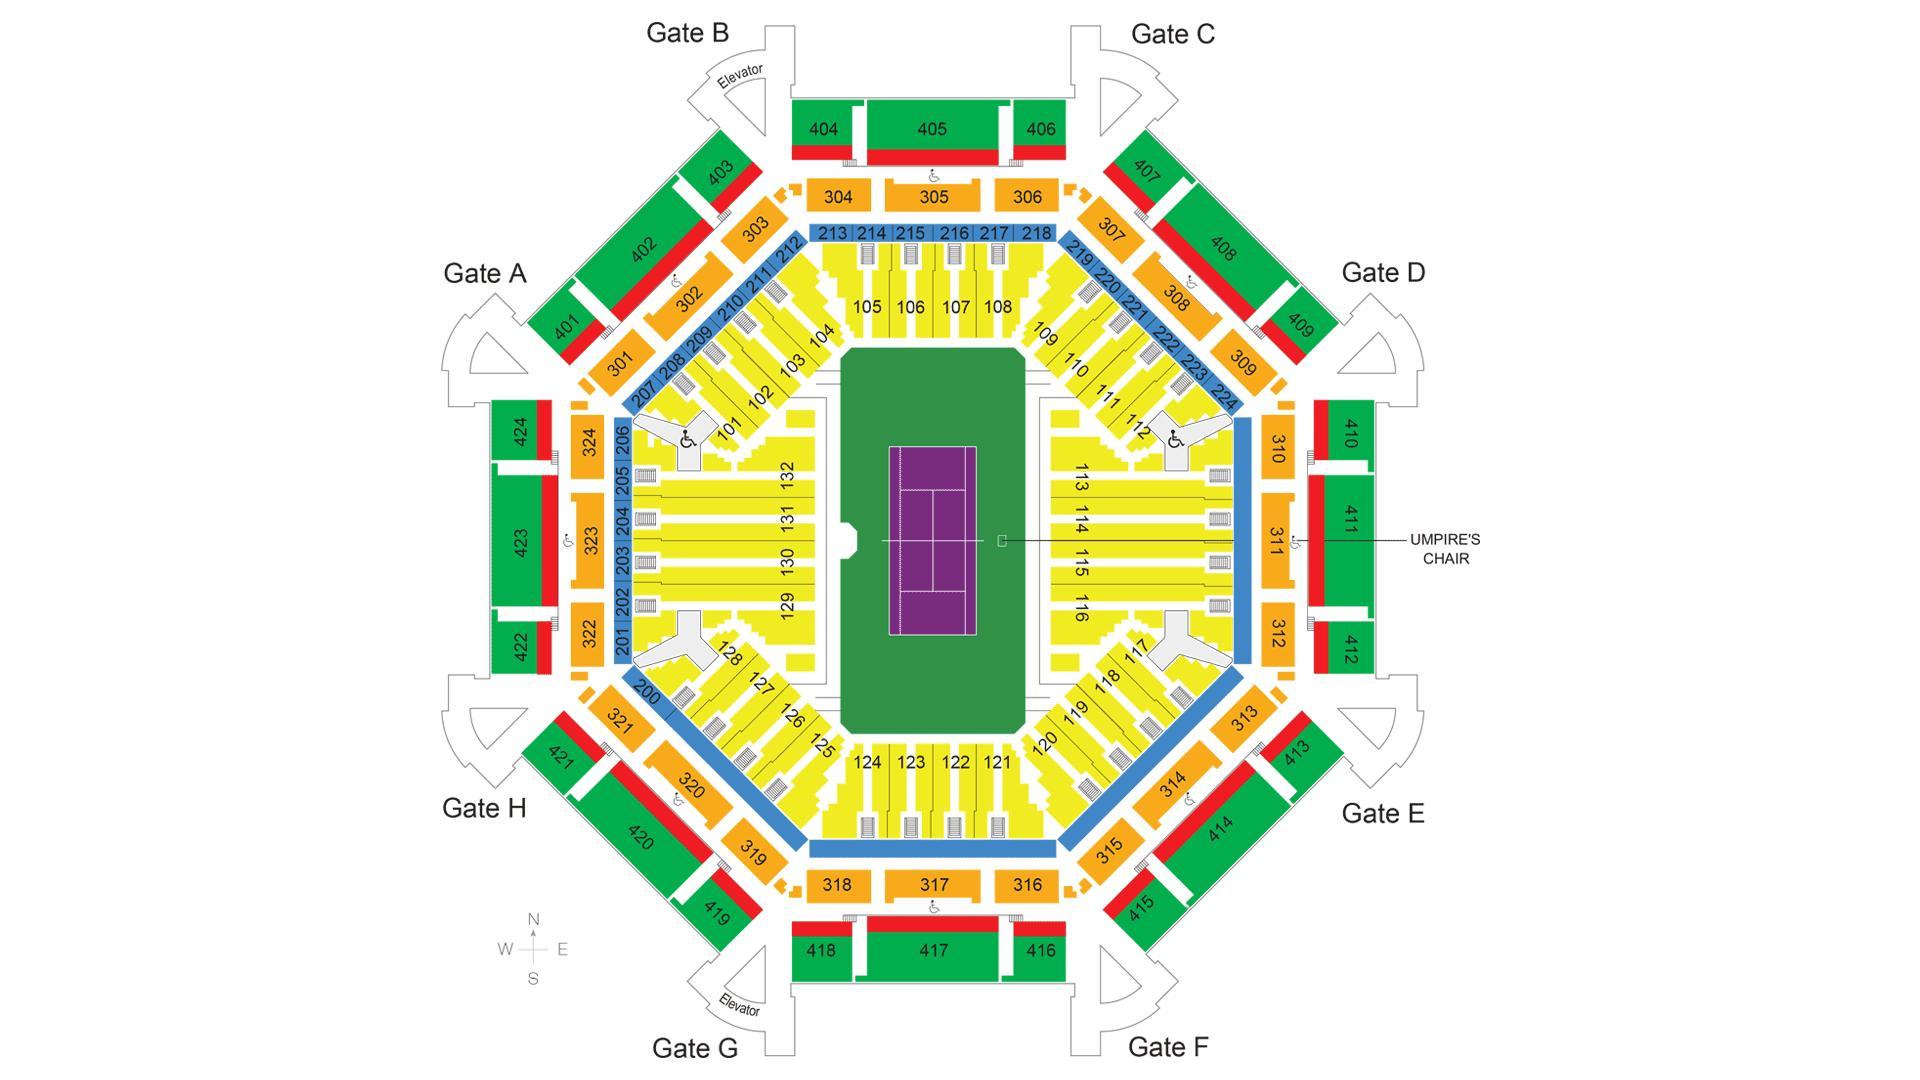 kart over dubai Dubai tennisstadion kart   Kart over Dubai tennisstadion (Forente  kart over dubai